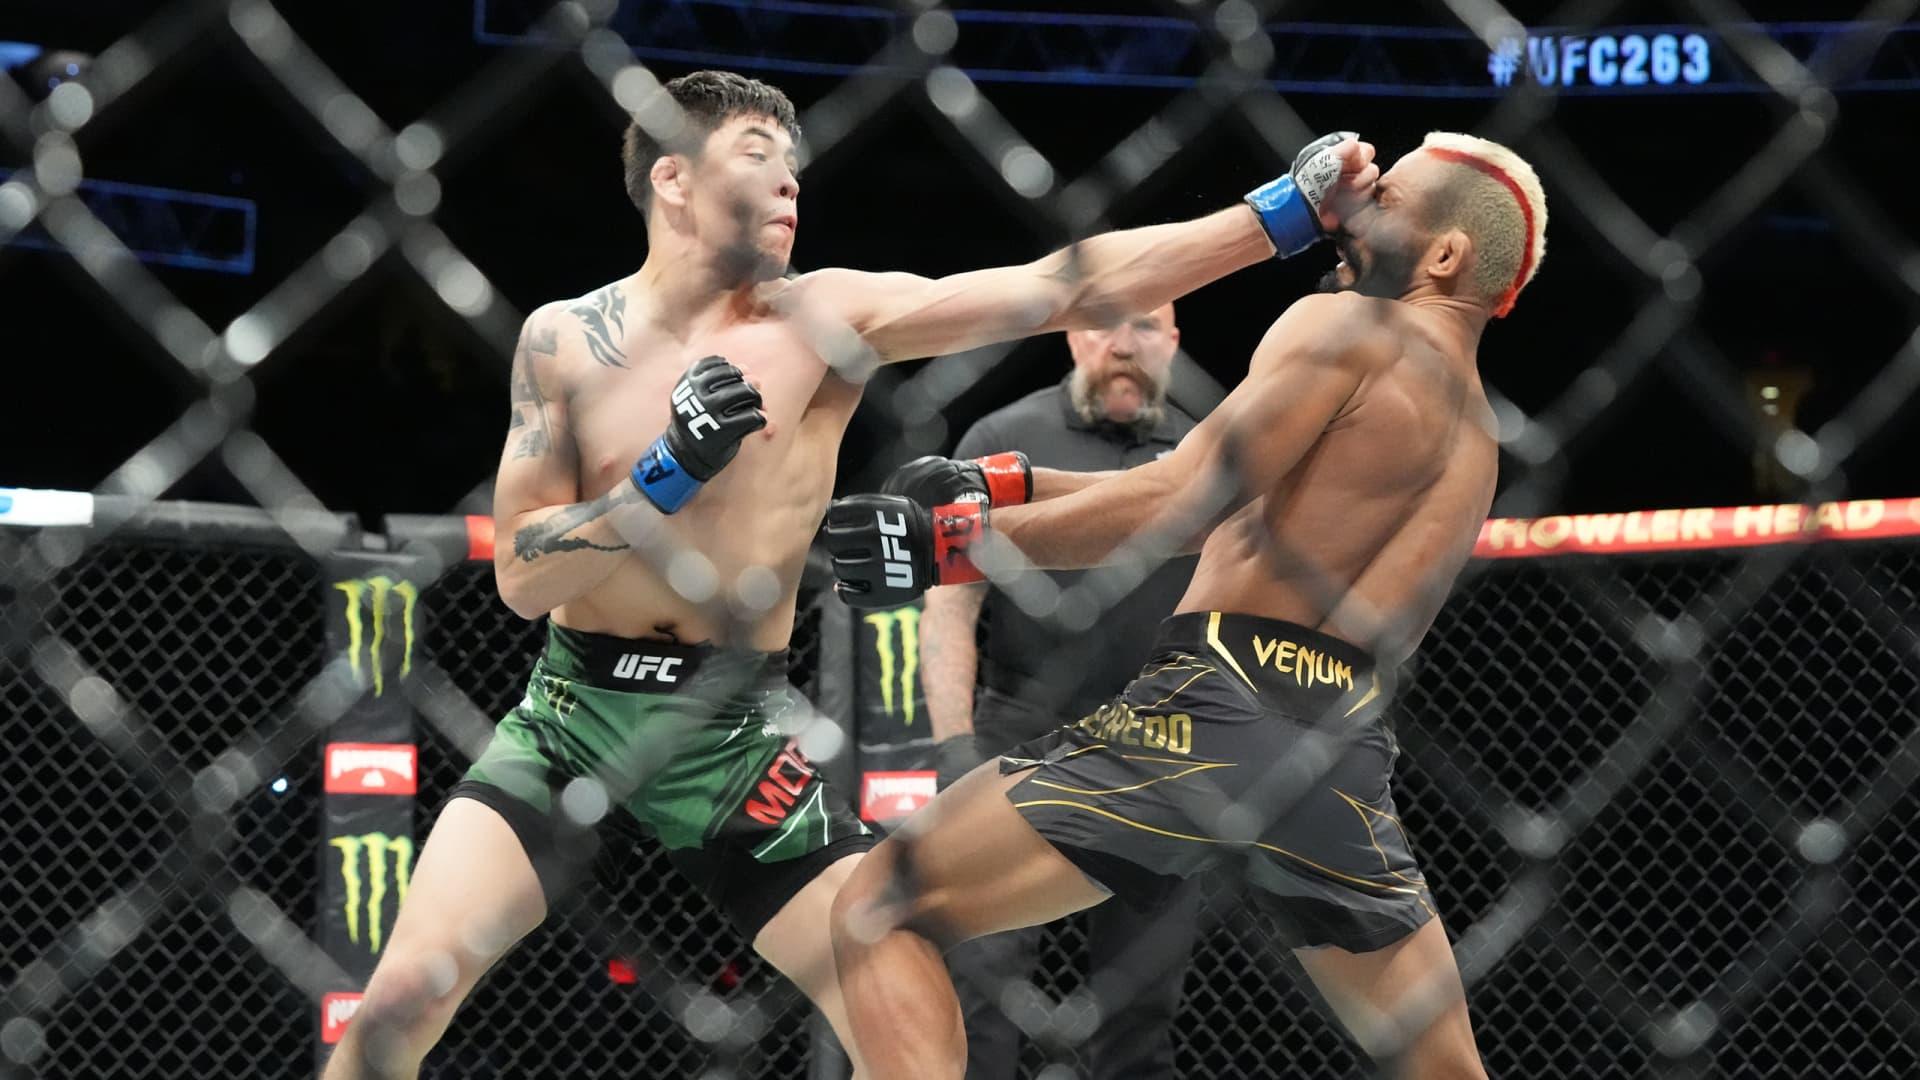 Deiveson Figueiredo (red gloves) and Brandon Moreno (blue gloves) during UFC 263 on June 12, 2021, at Gila River Arena in Glendale, AZ.